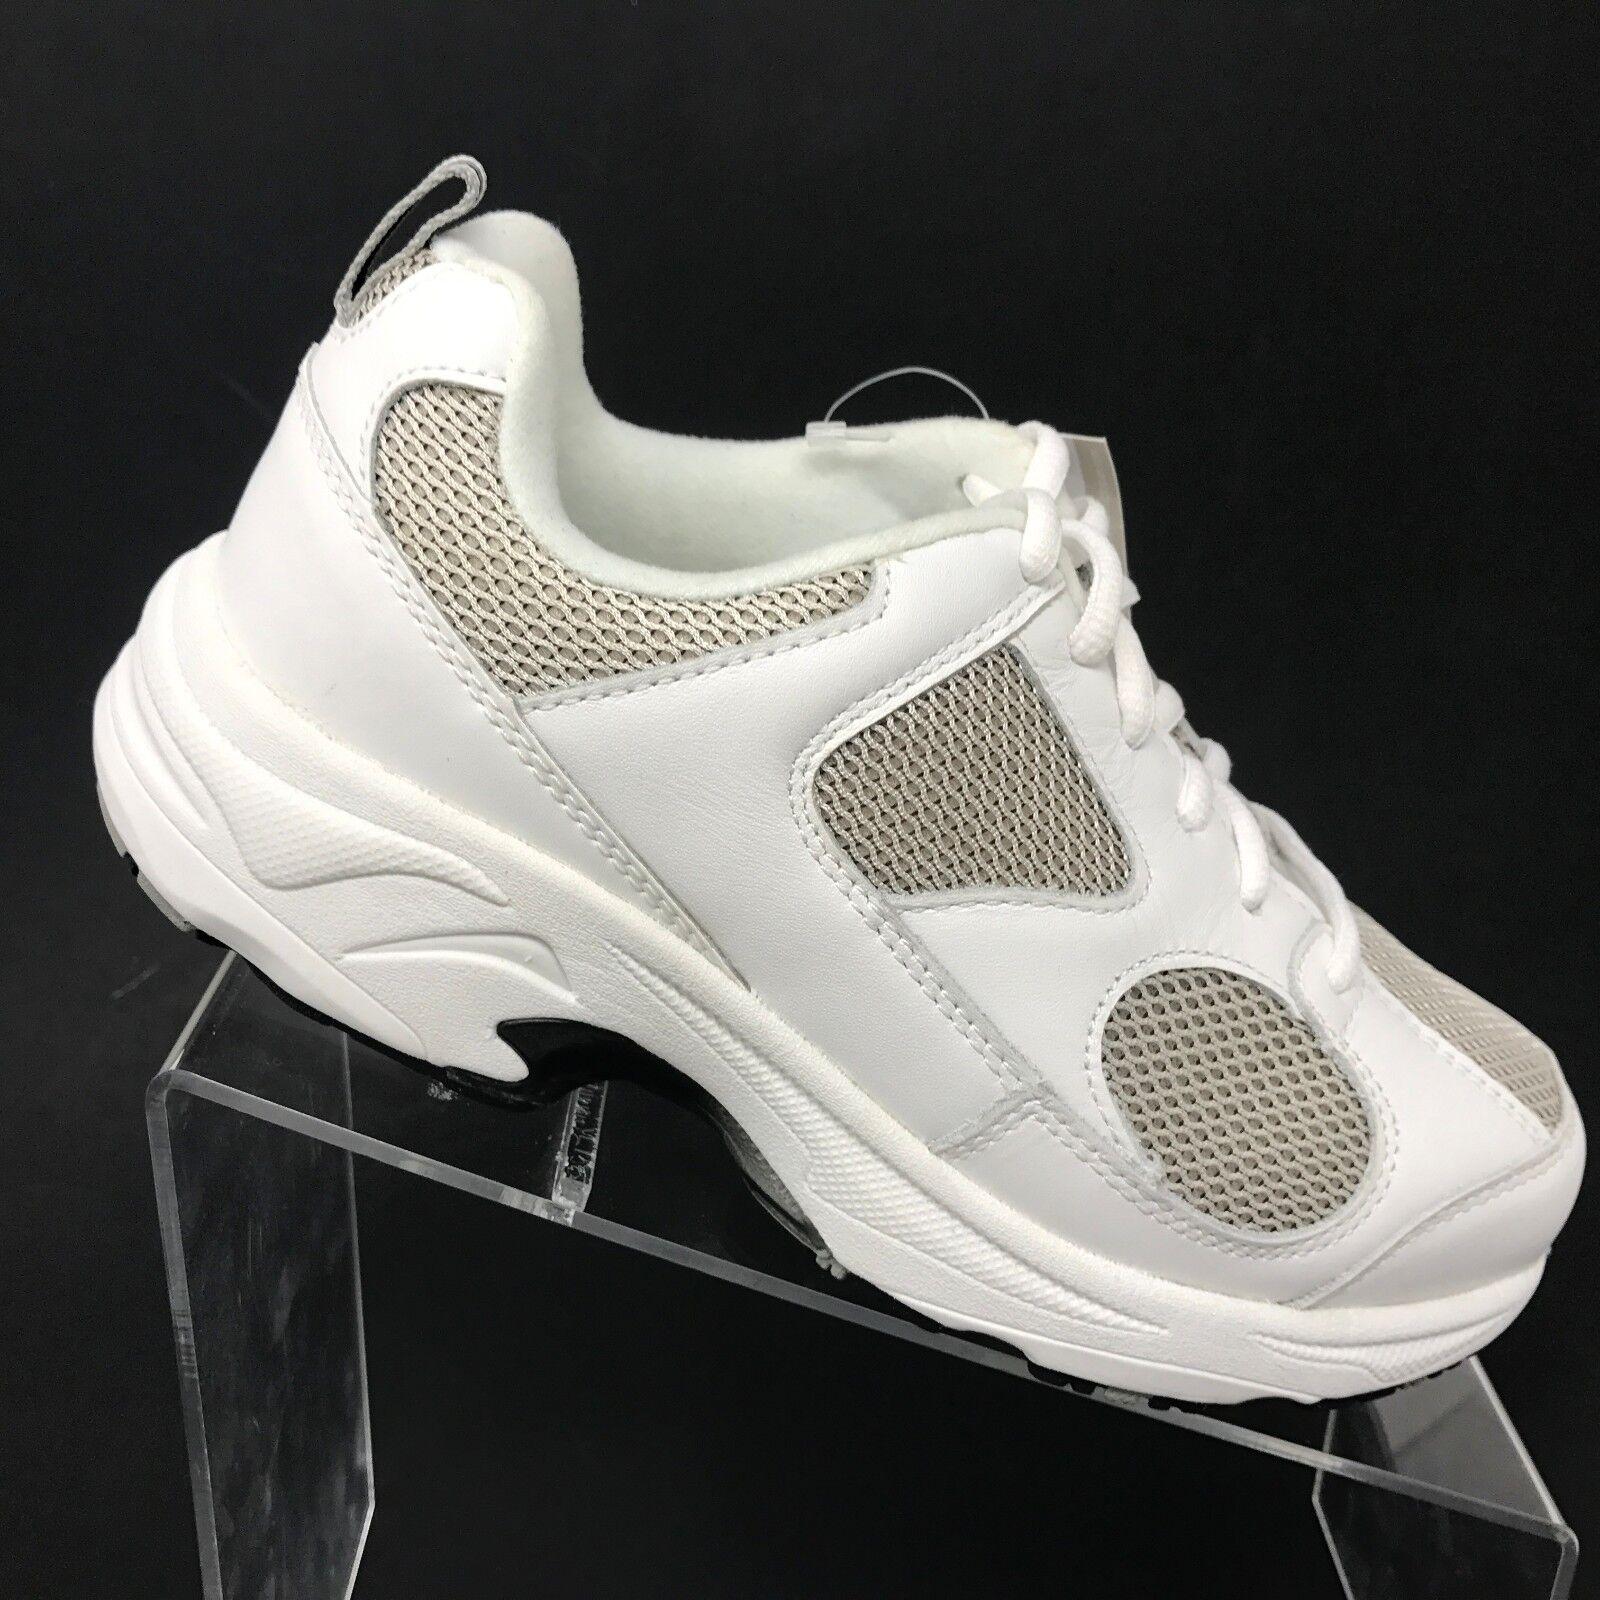 Drew Flash II bianca Athletic scarpe da ginnastica Diabetic Orthotic Orthotic Orthotic scarpe donna Dimensione 6 XW 5cf184